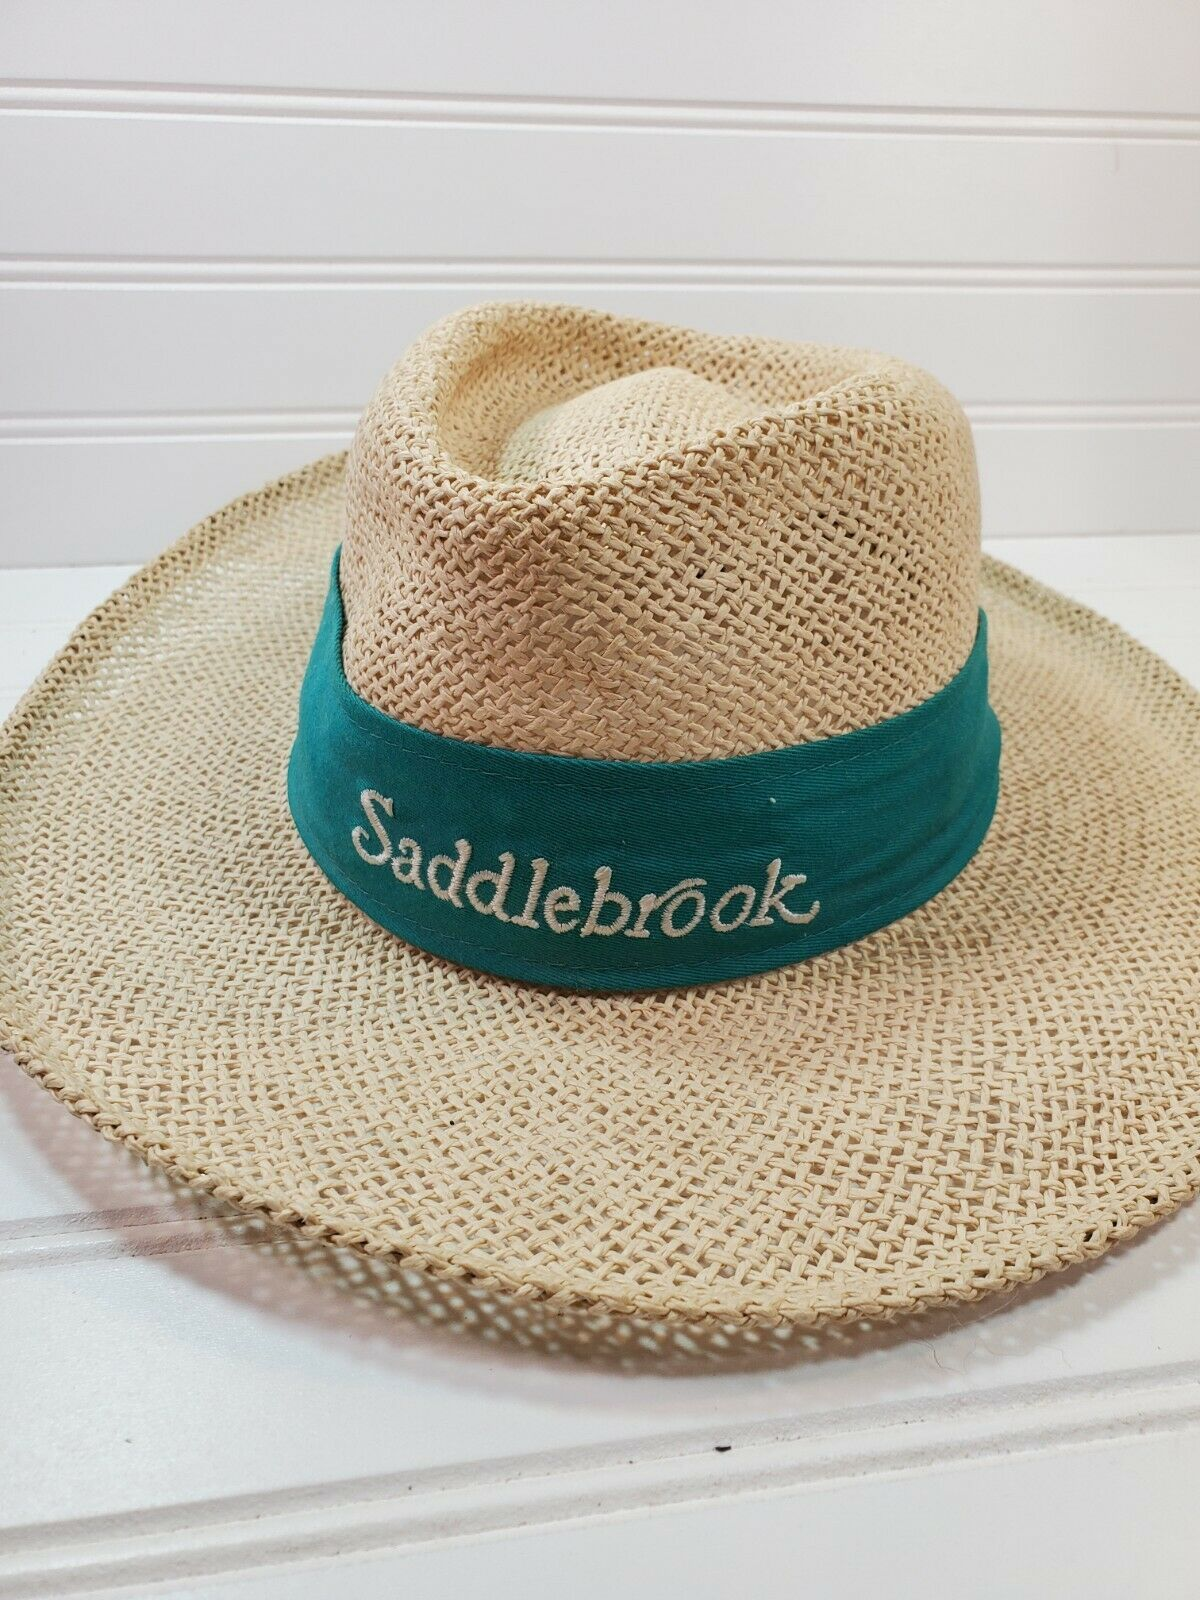 Saddlebrook Golf Club straw hat Cap golf, tennis … - image 1